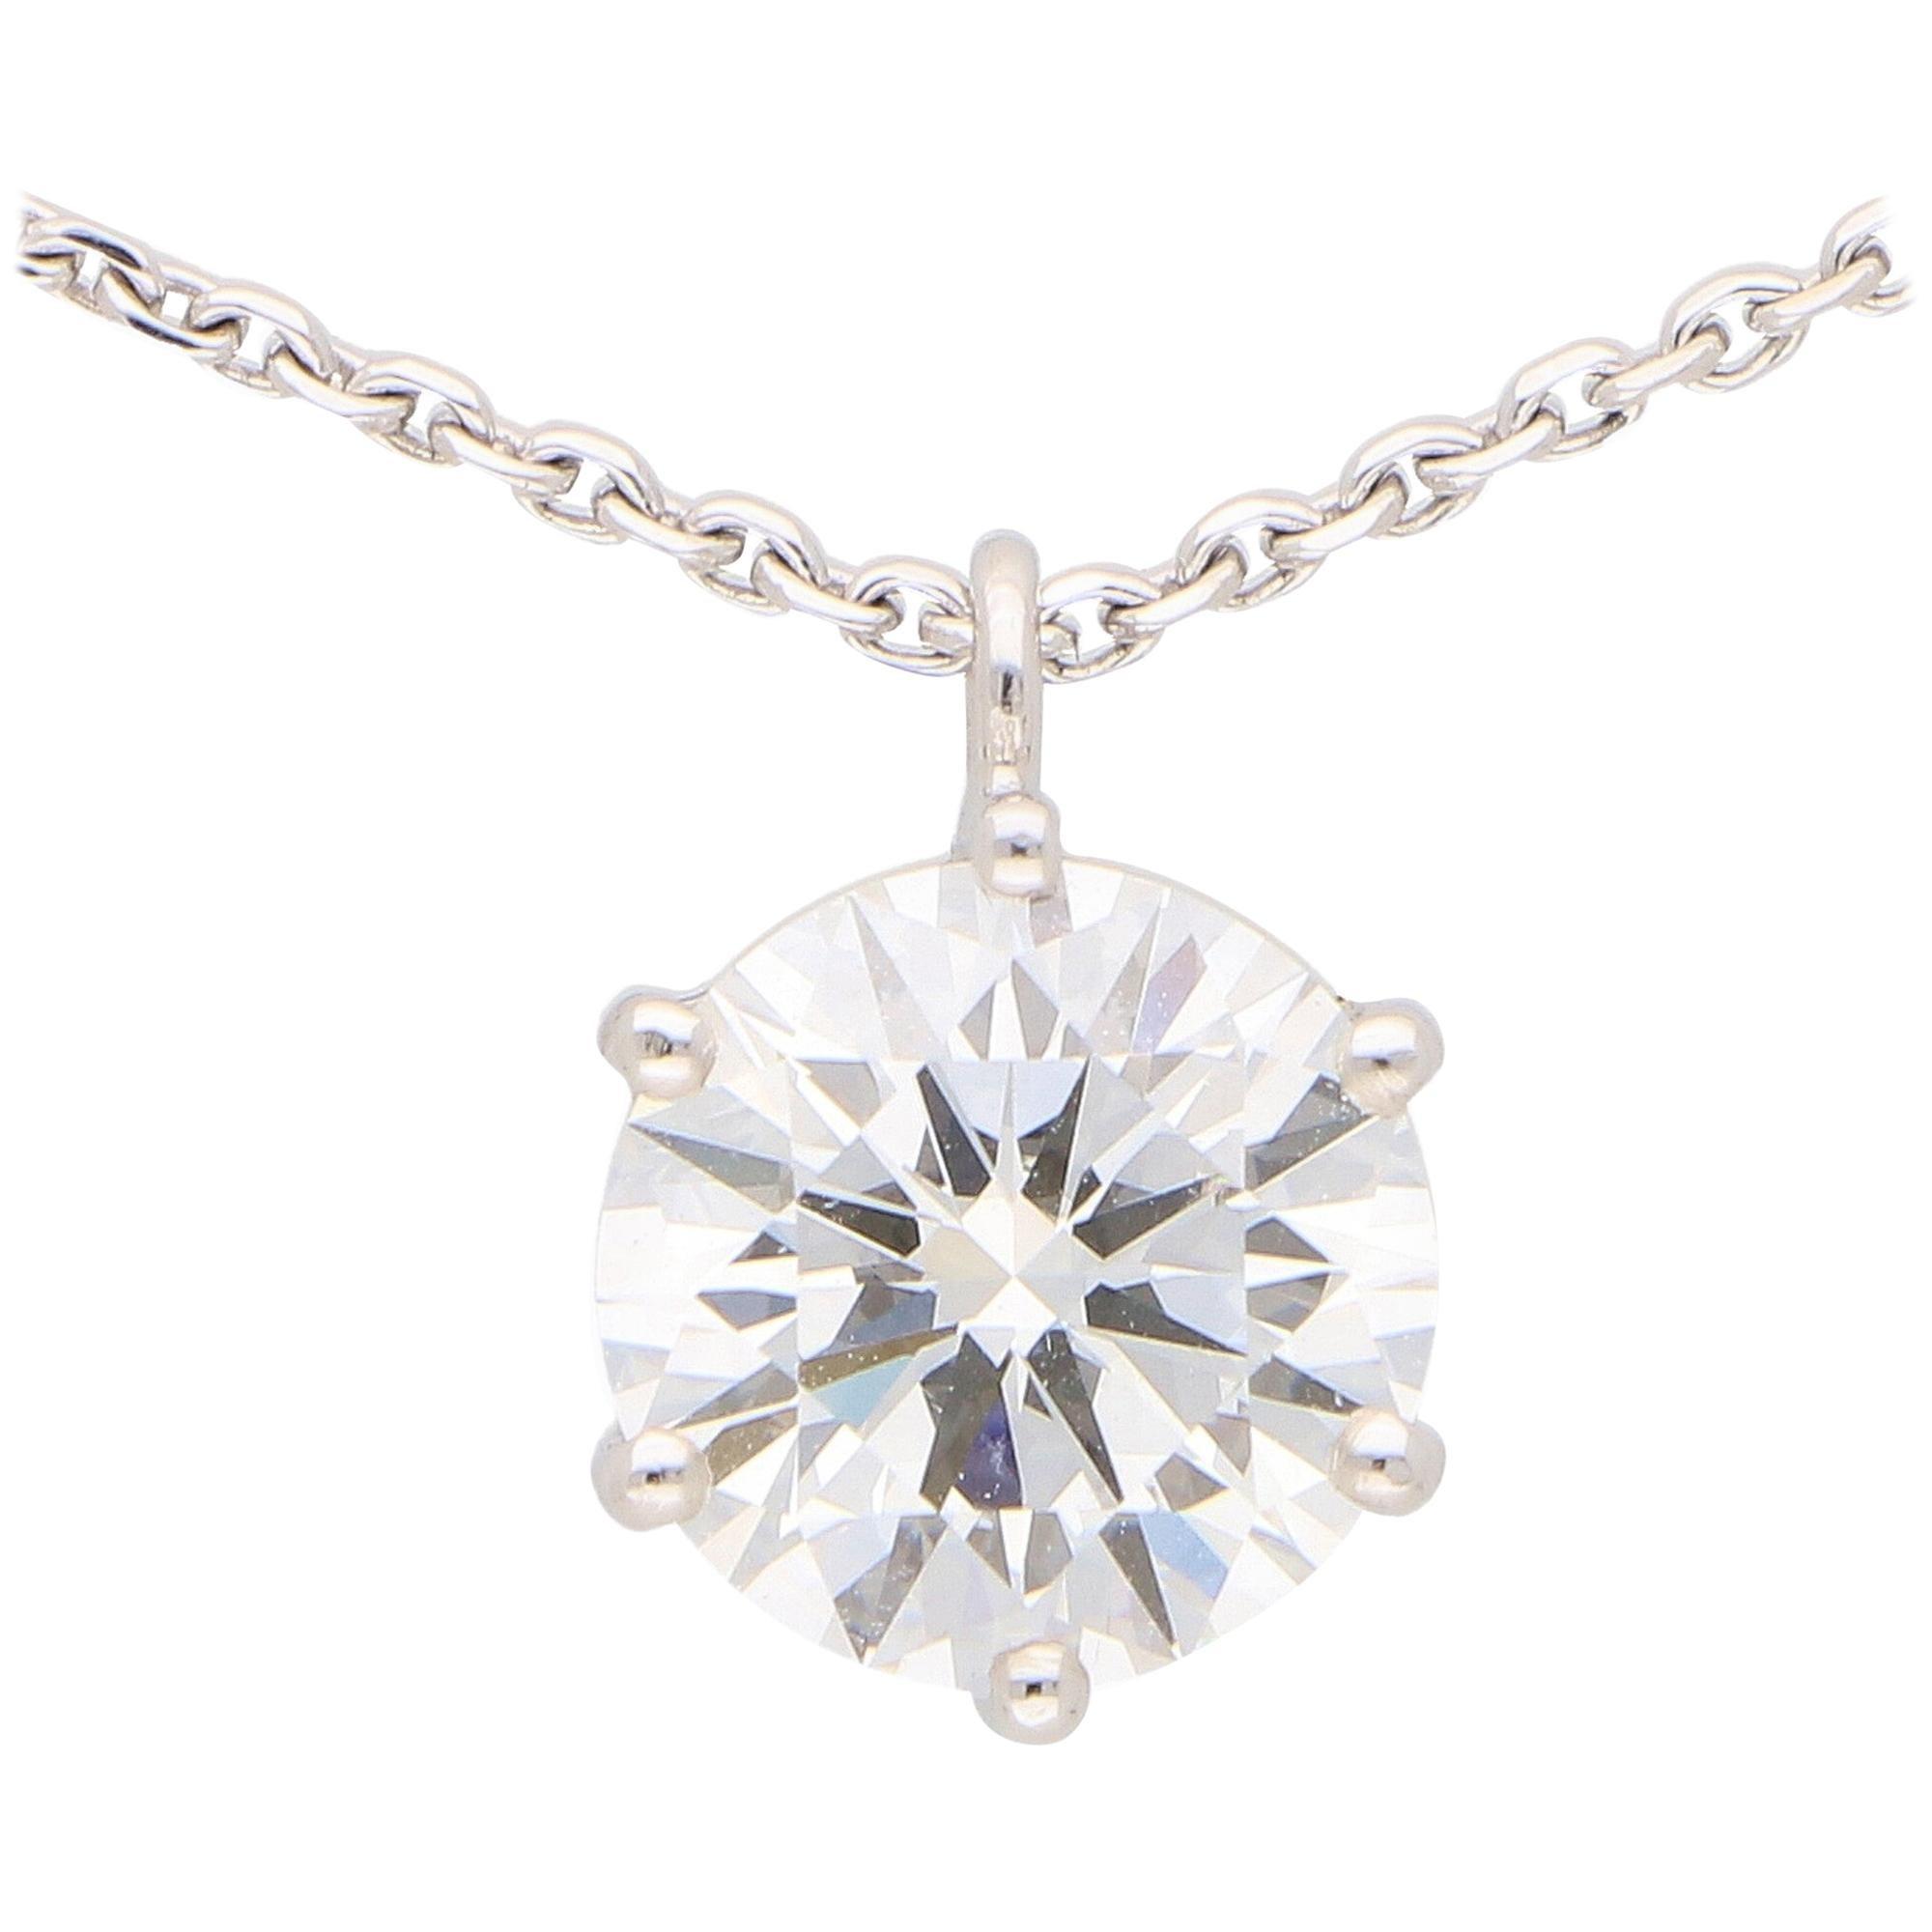 GIA Certified, 2.40 Carat, D Color Single Diamond Pendant in 18 Karat White Gold